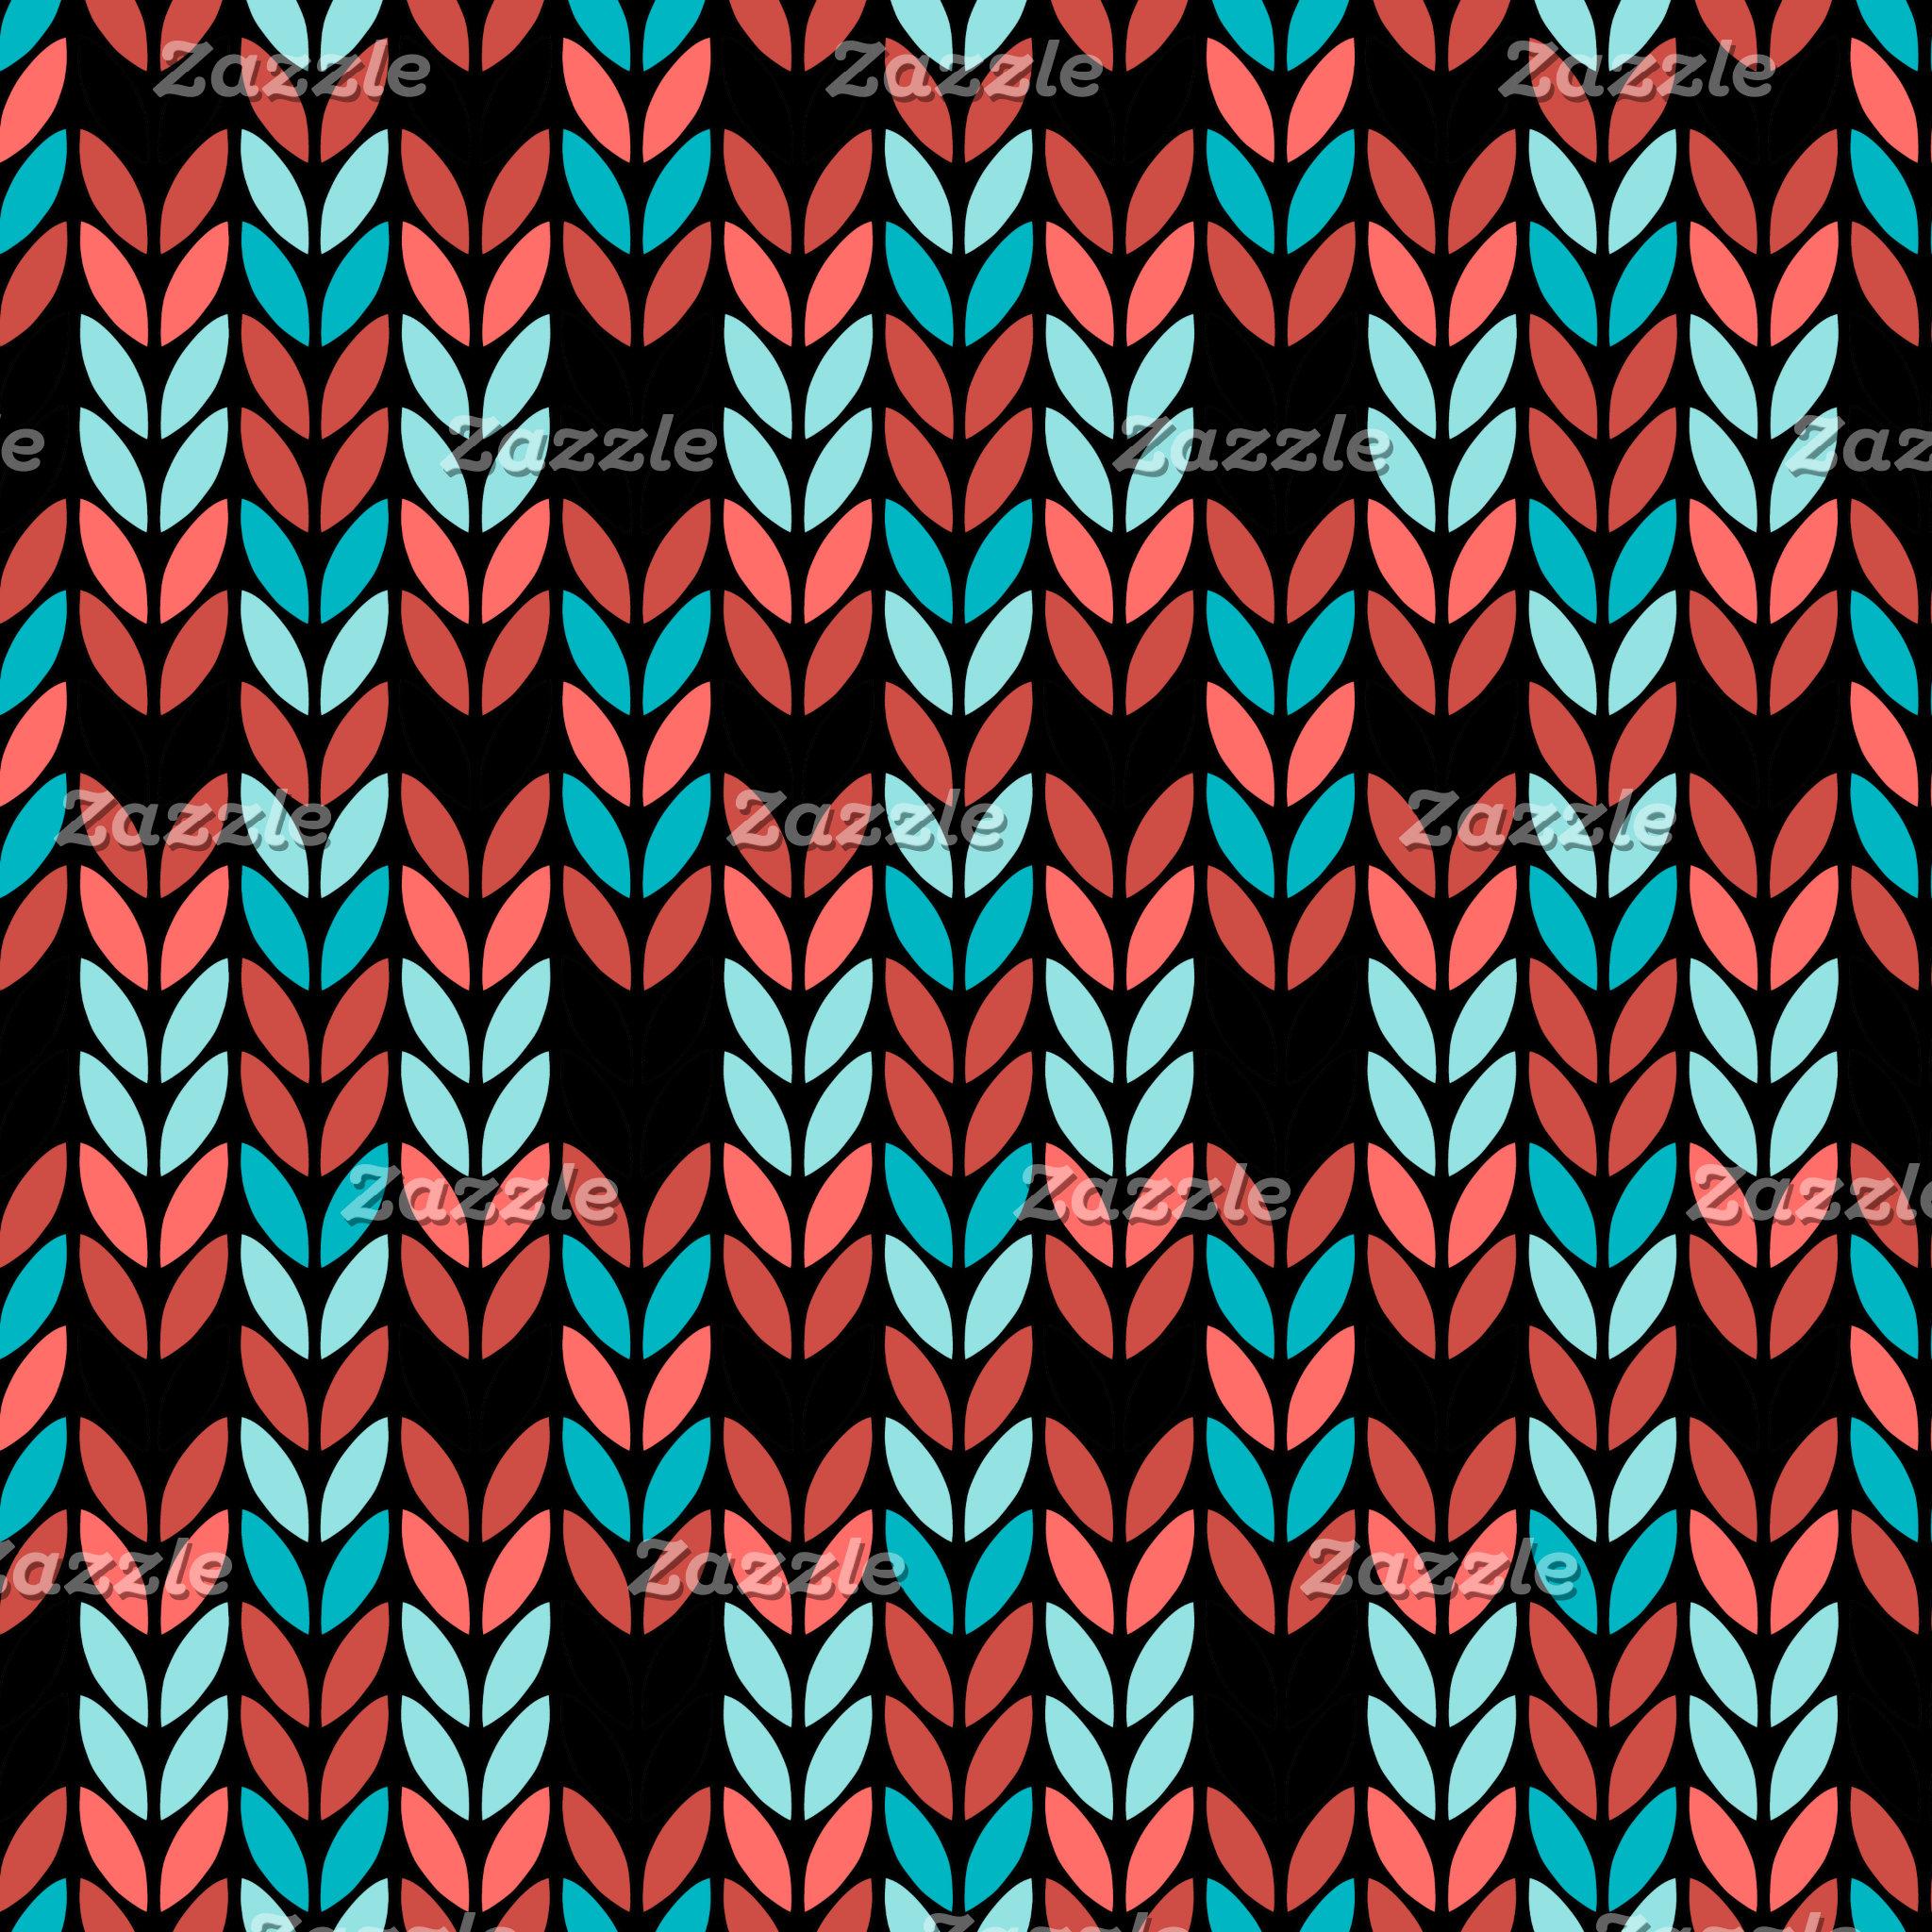 Groovy Knit Designs